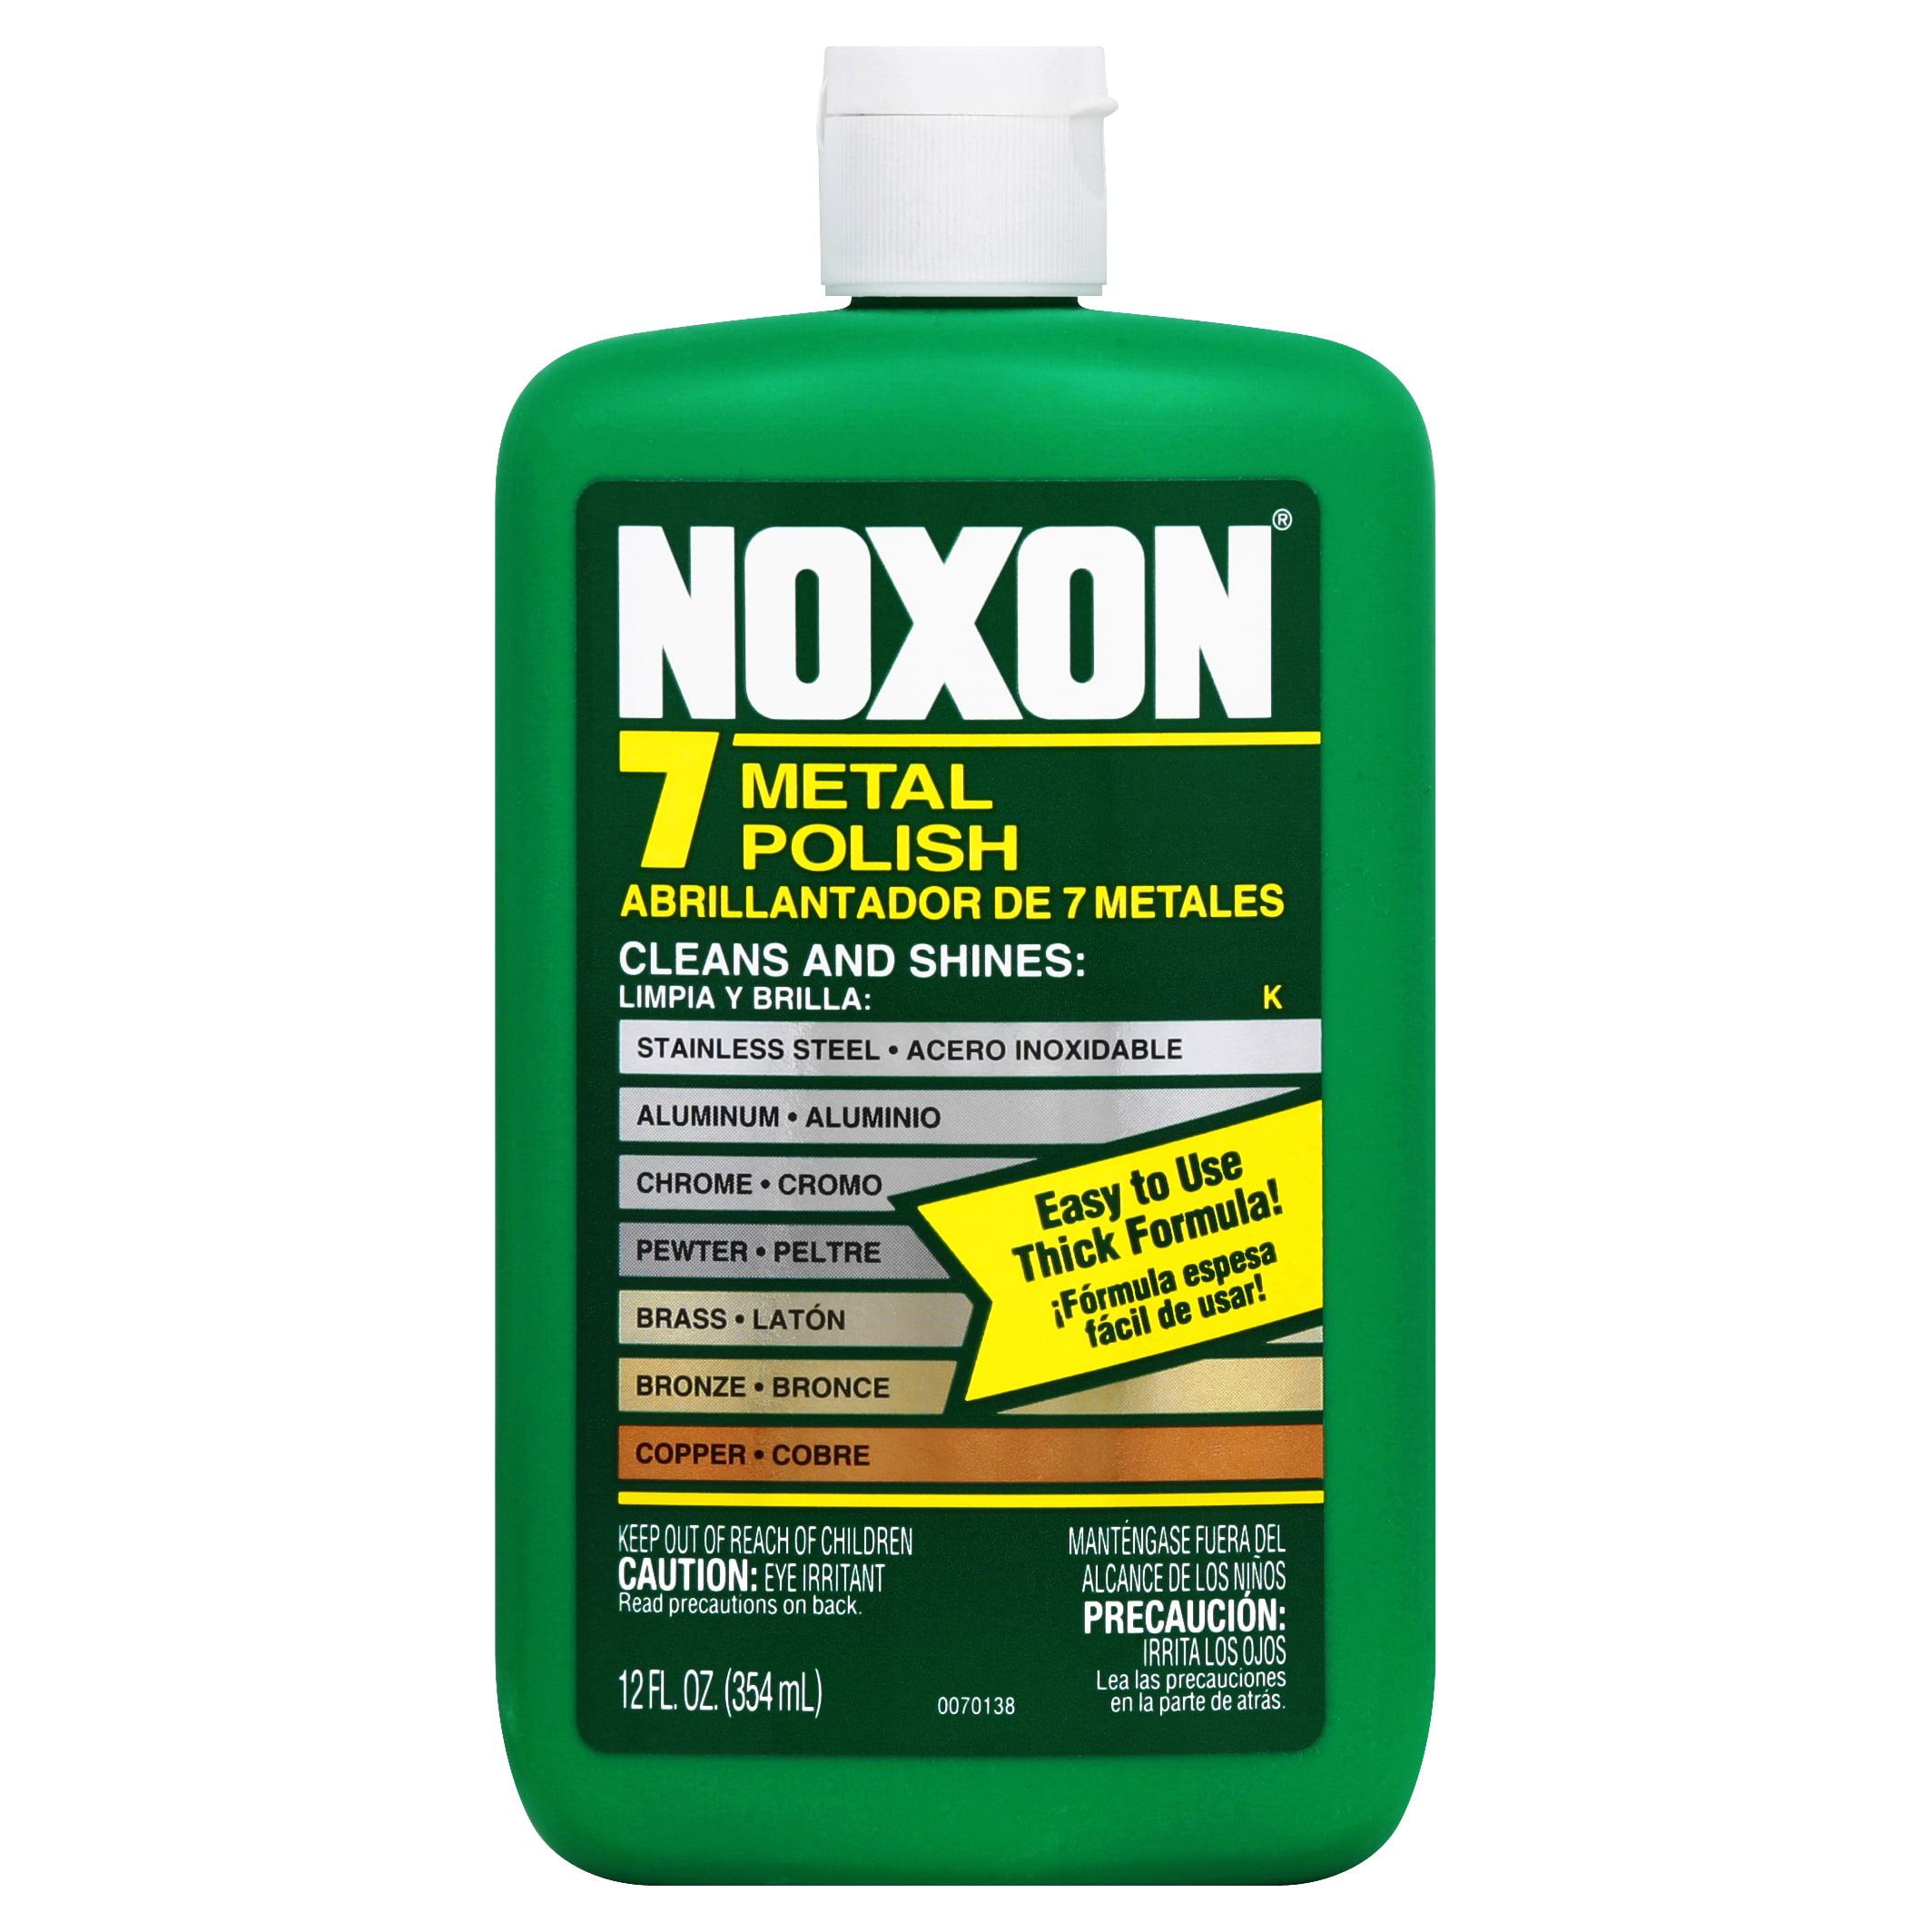 Noxon 7 Liquid Metal Polish, 12oz Bottle for Brass, Copper, Stainless, Chrome, Aluminum, Pewter & Bronze